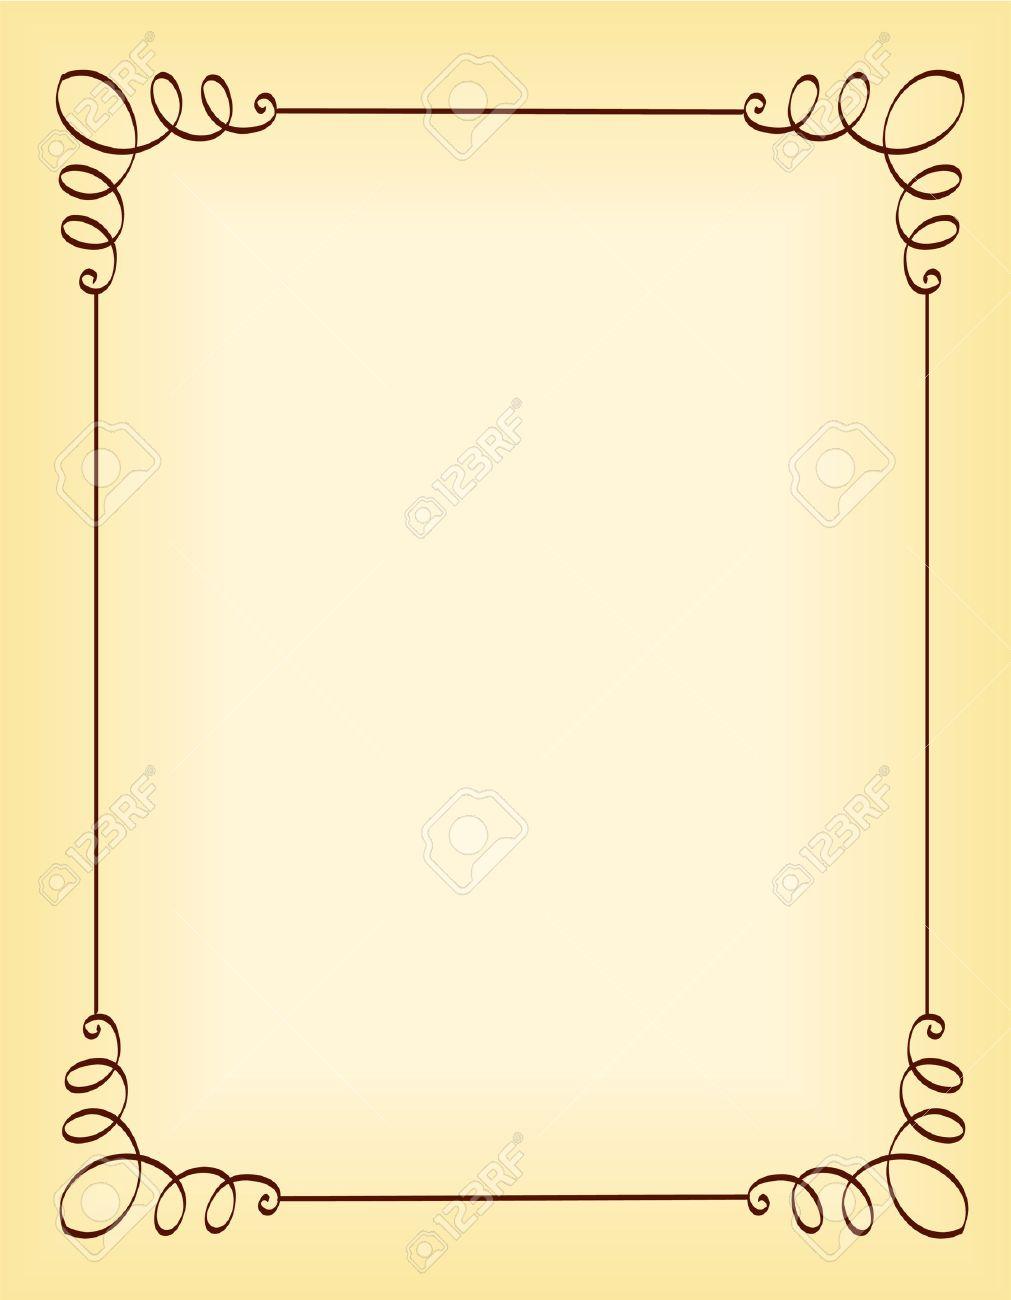 Unique Ornamental Border Frame For Party Invitation Backgrounds 1011x1300